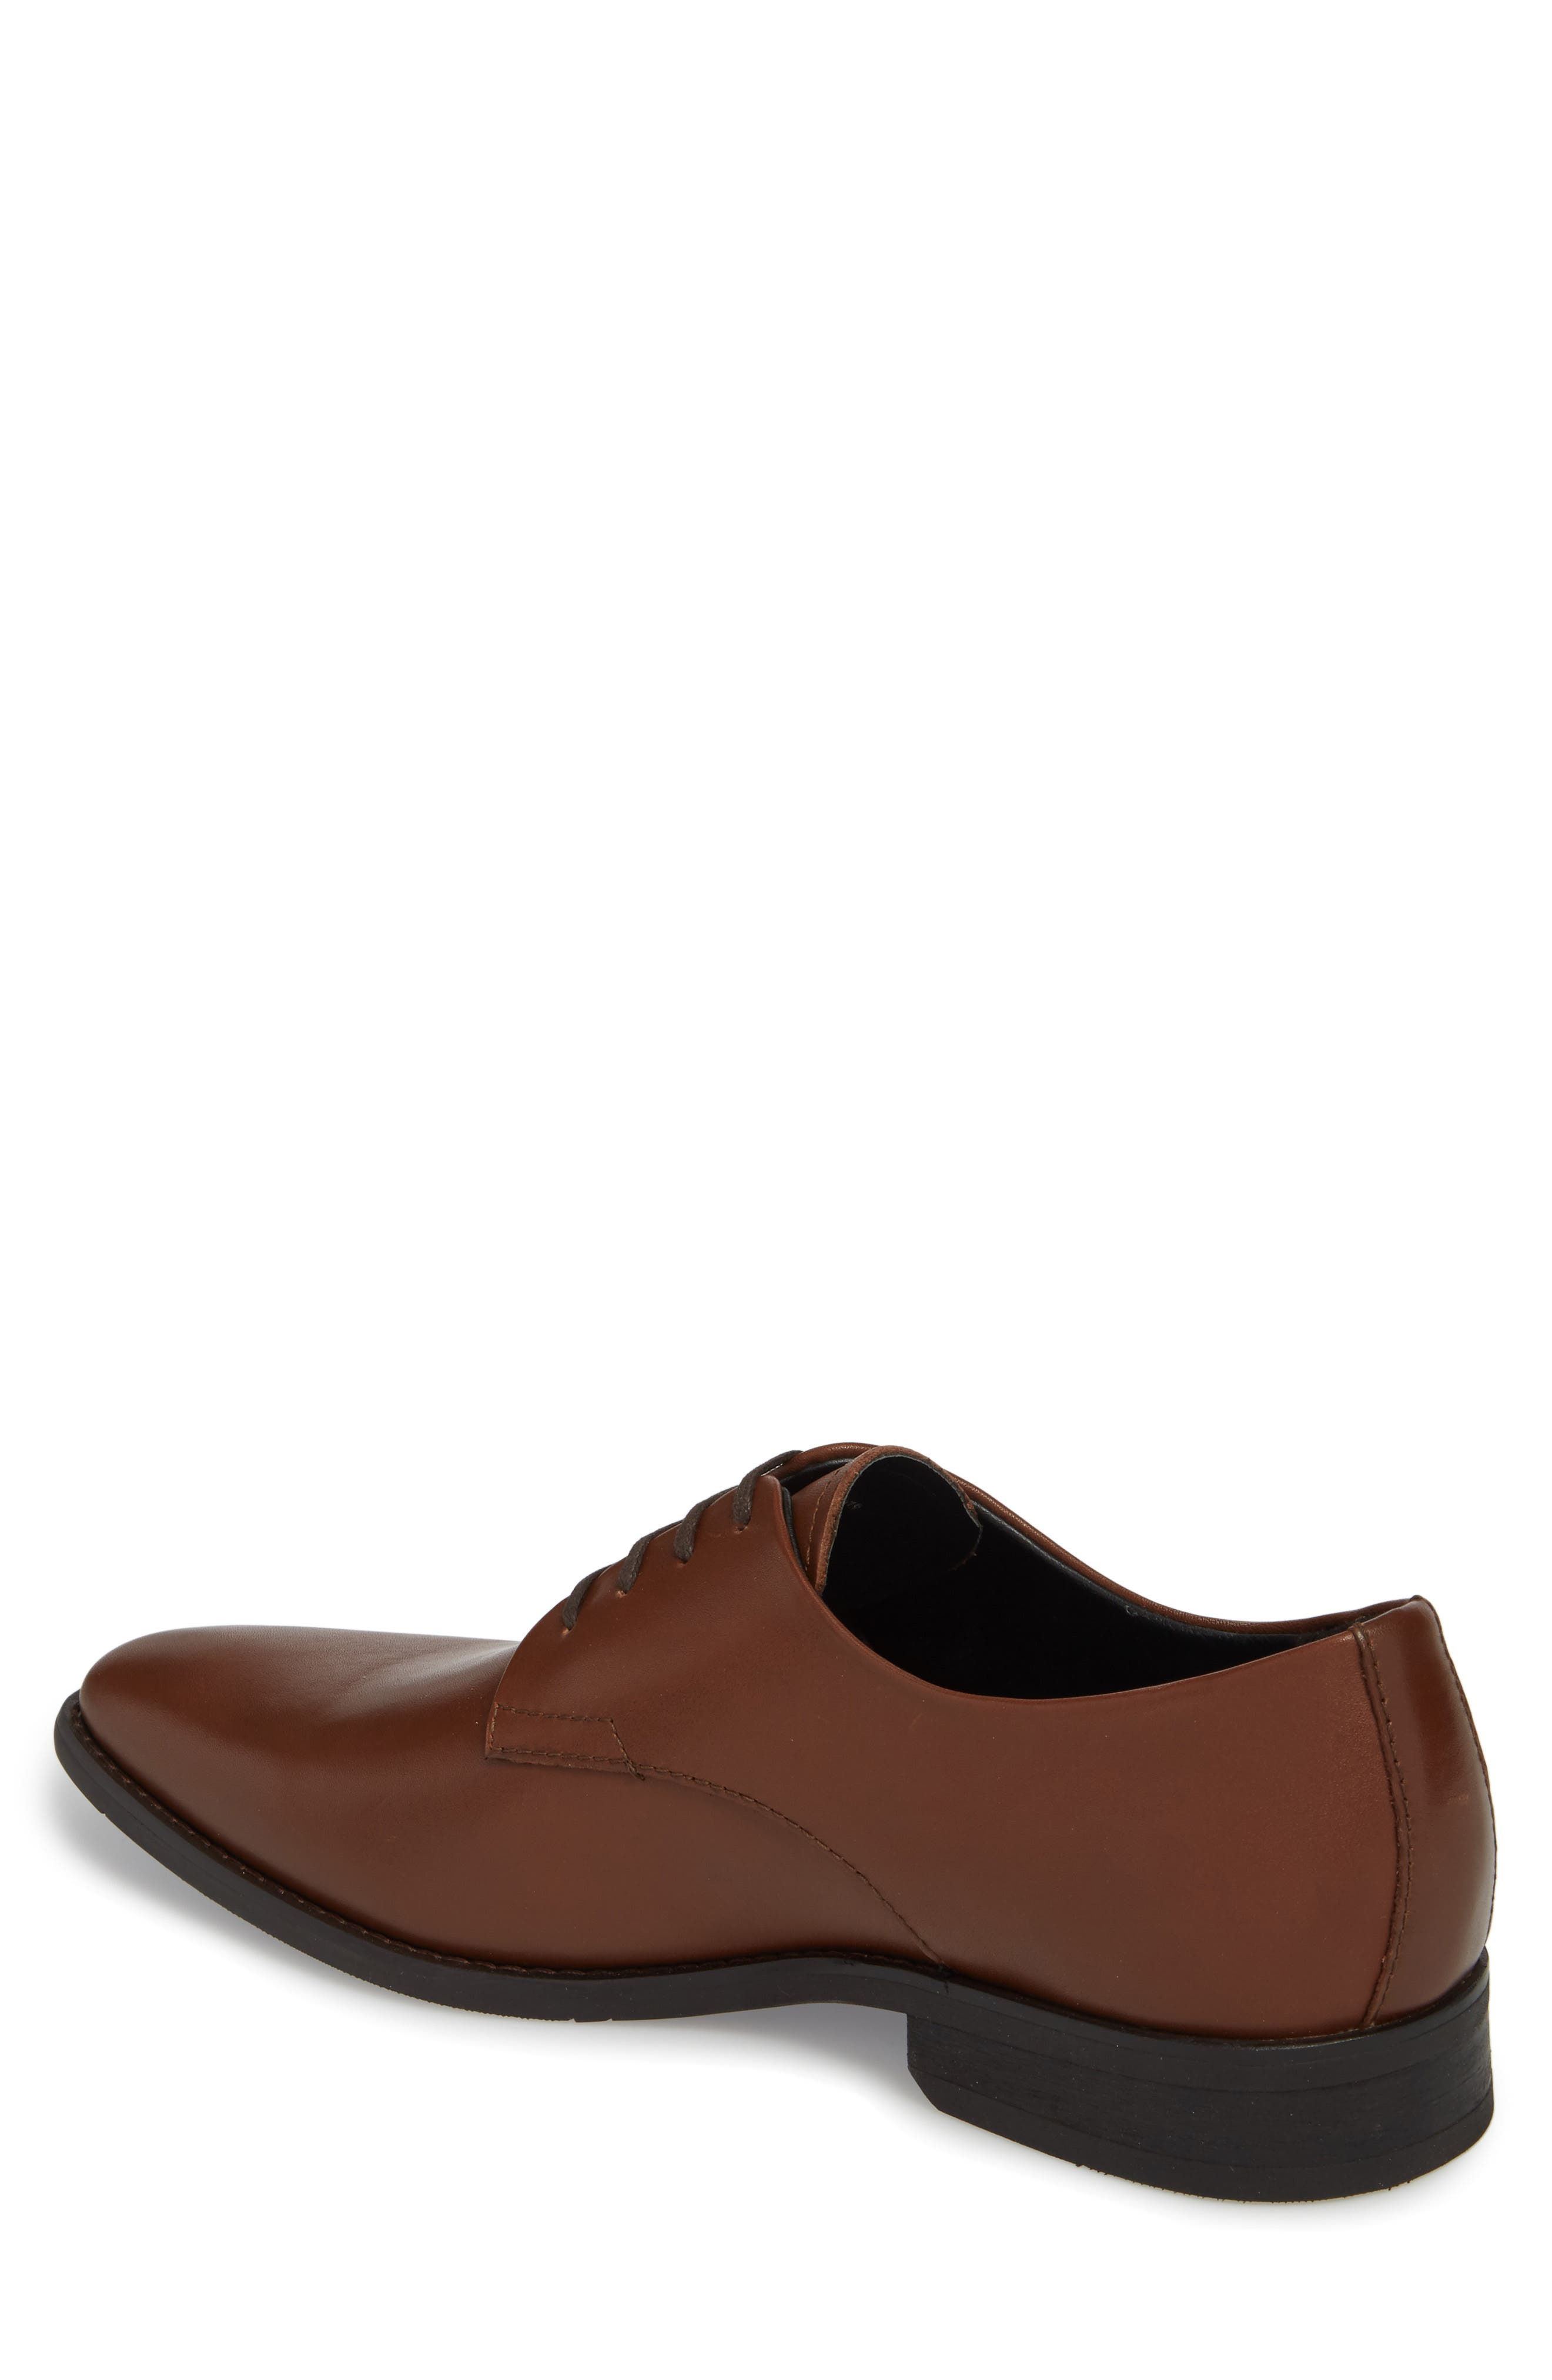 ,                             'Ramses' Plain Toe Derby,                             Alternate thumbnail 14, color,                             206